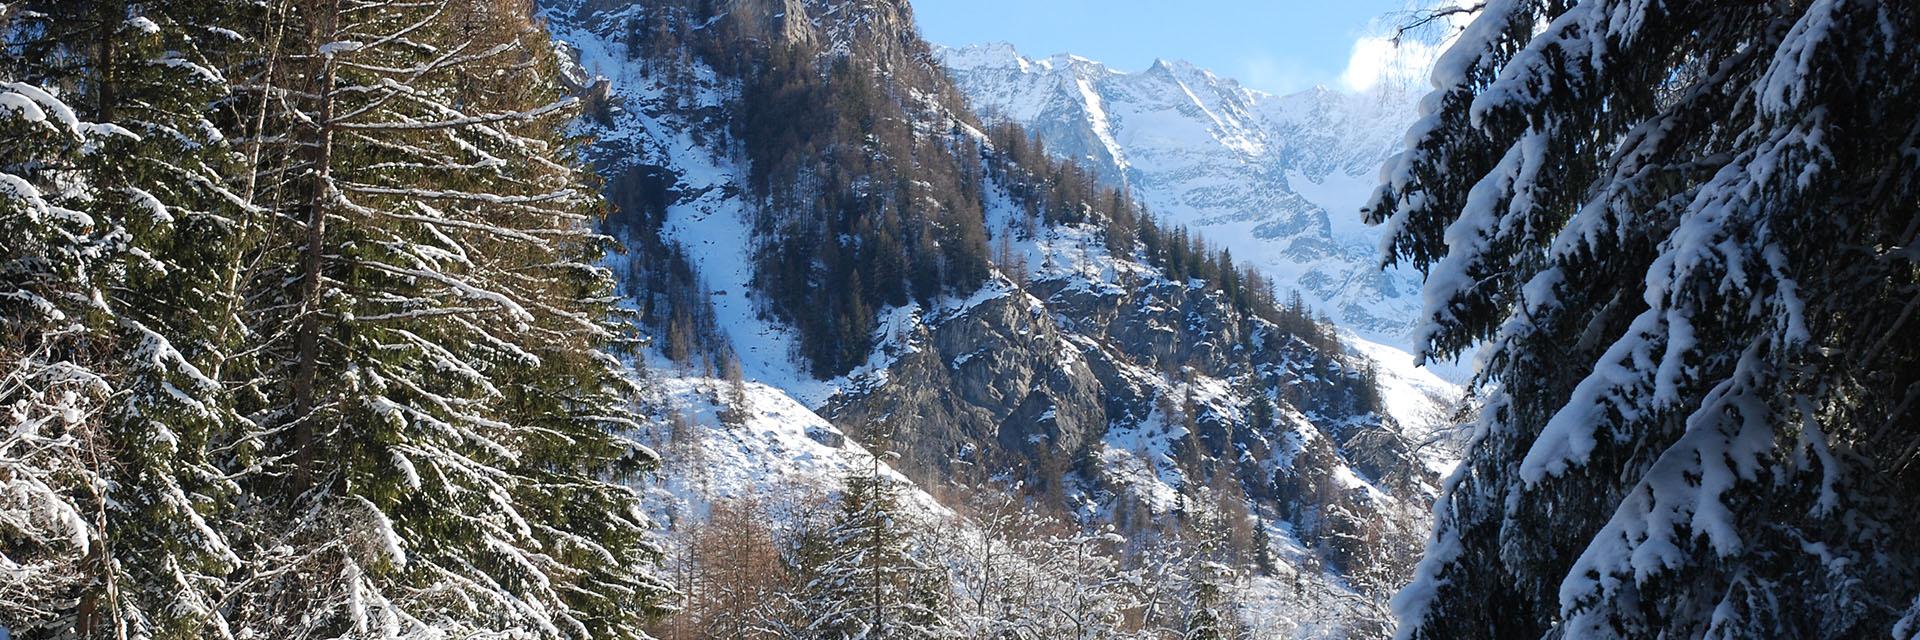 montagne-hiver-neige